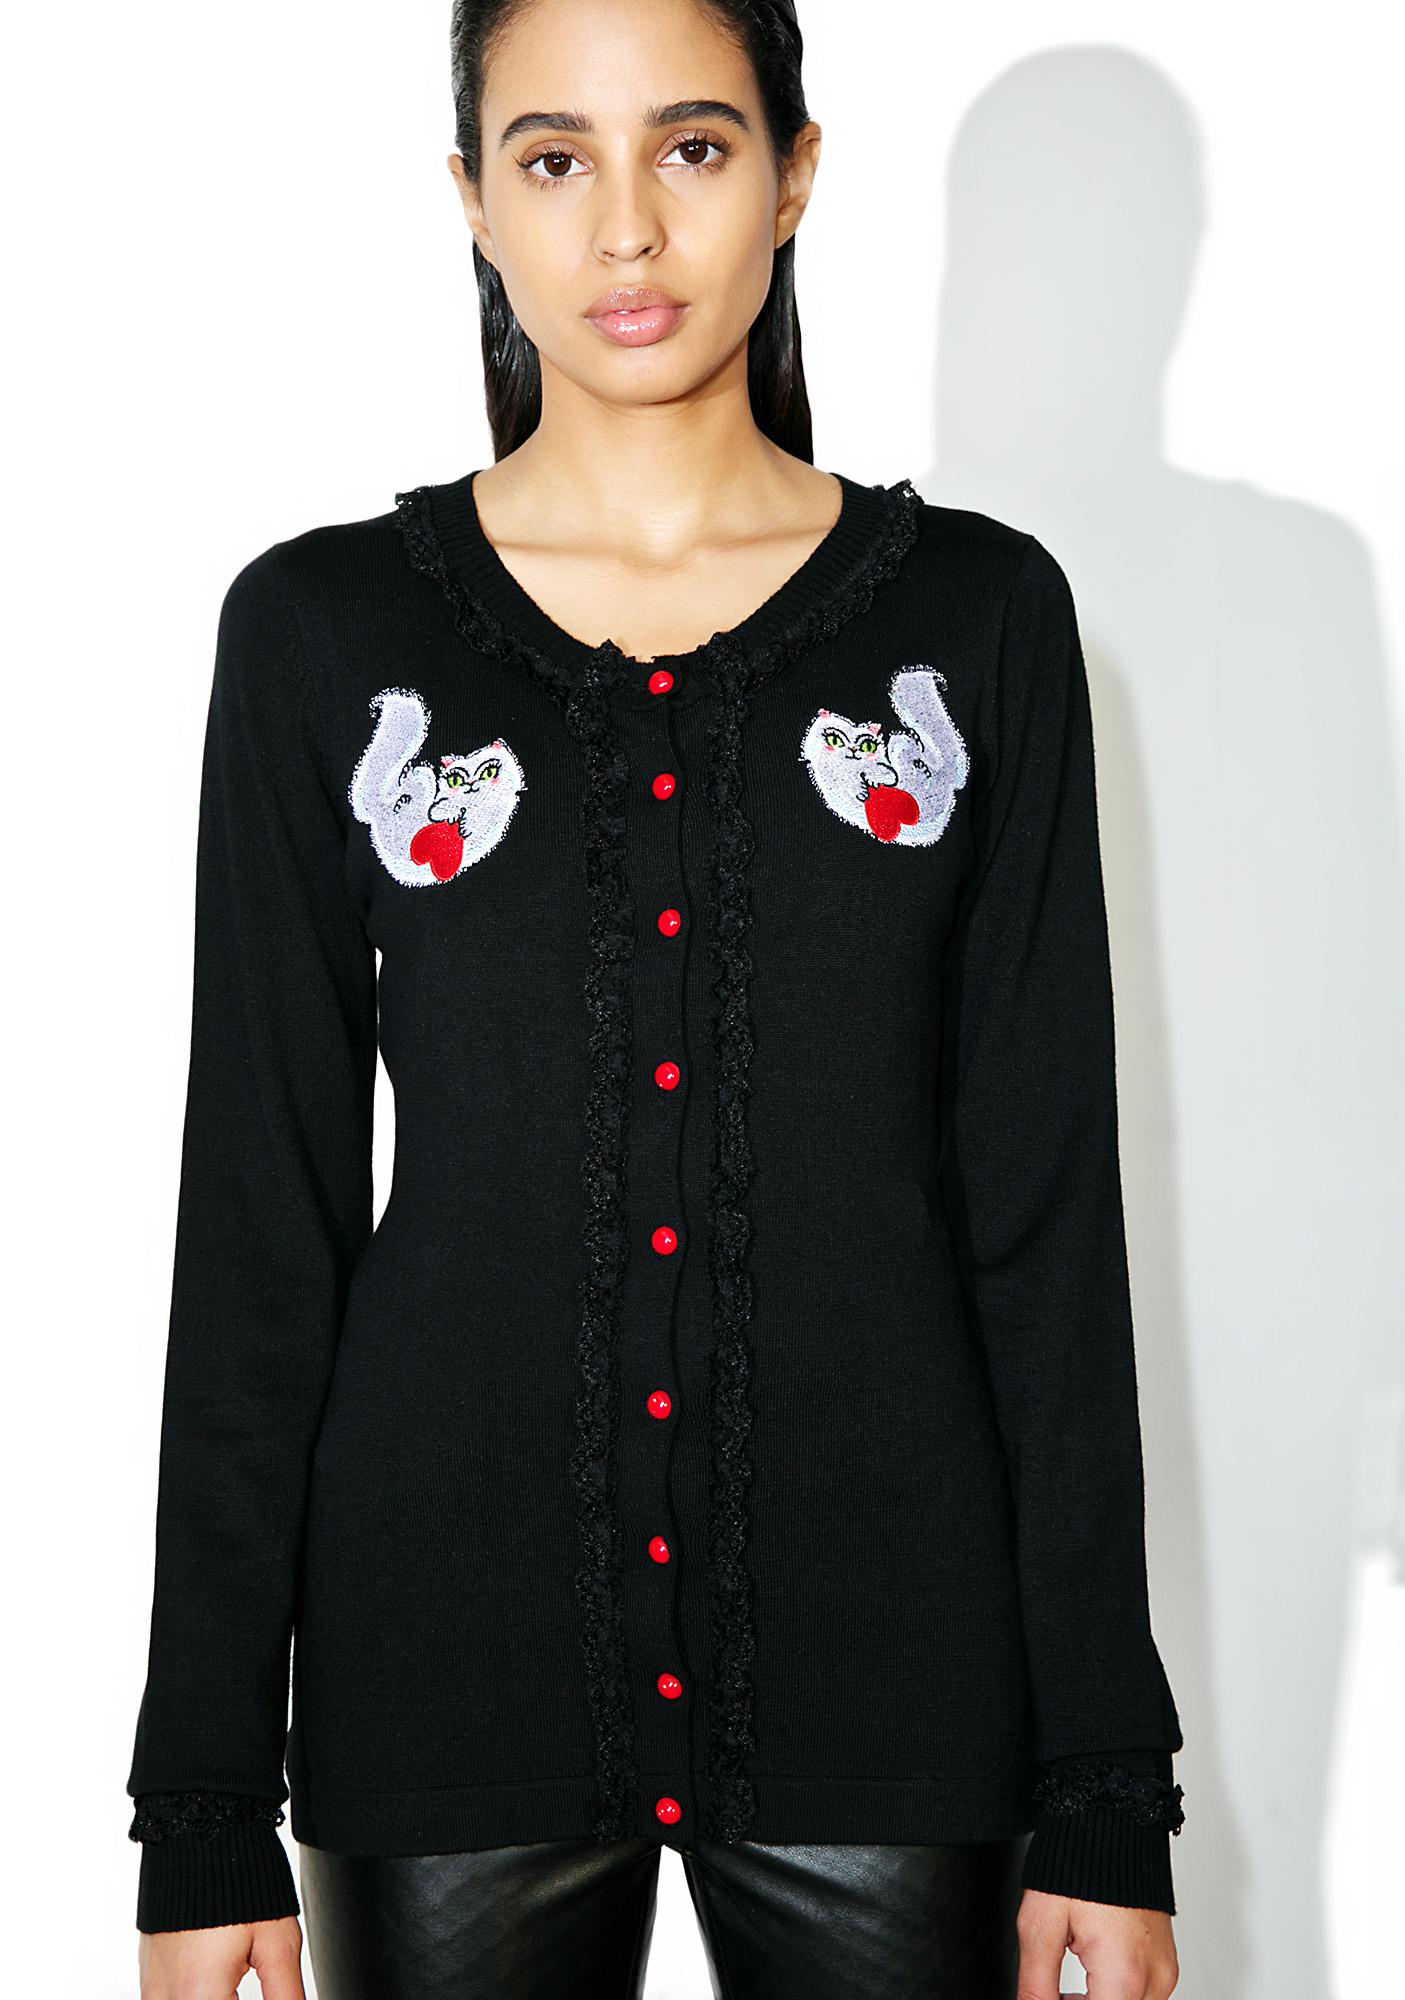 Sourpuss Clothing Cat Lady Lace Cardigan